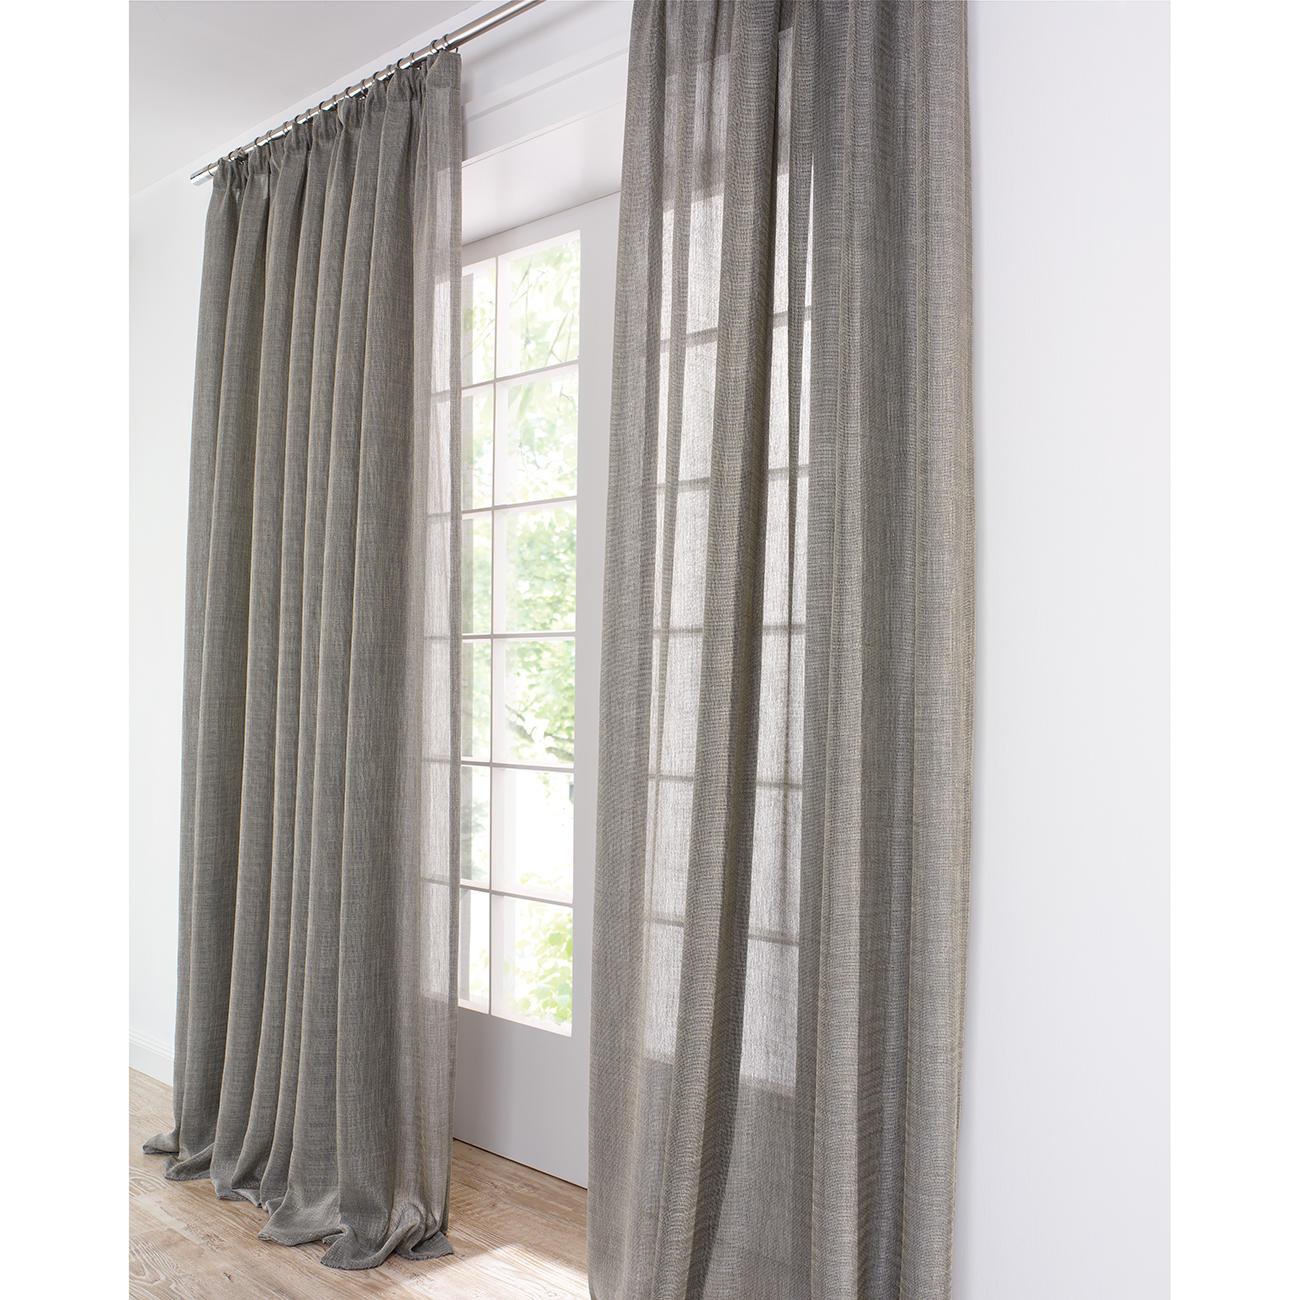 Schwerer Türvorhang schwerer vorhang schwerer vorhang with schwerer vorhang